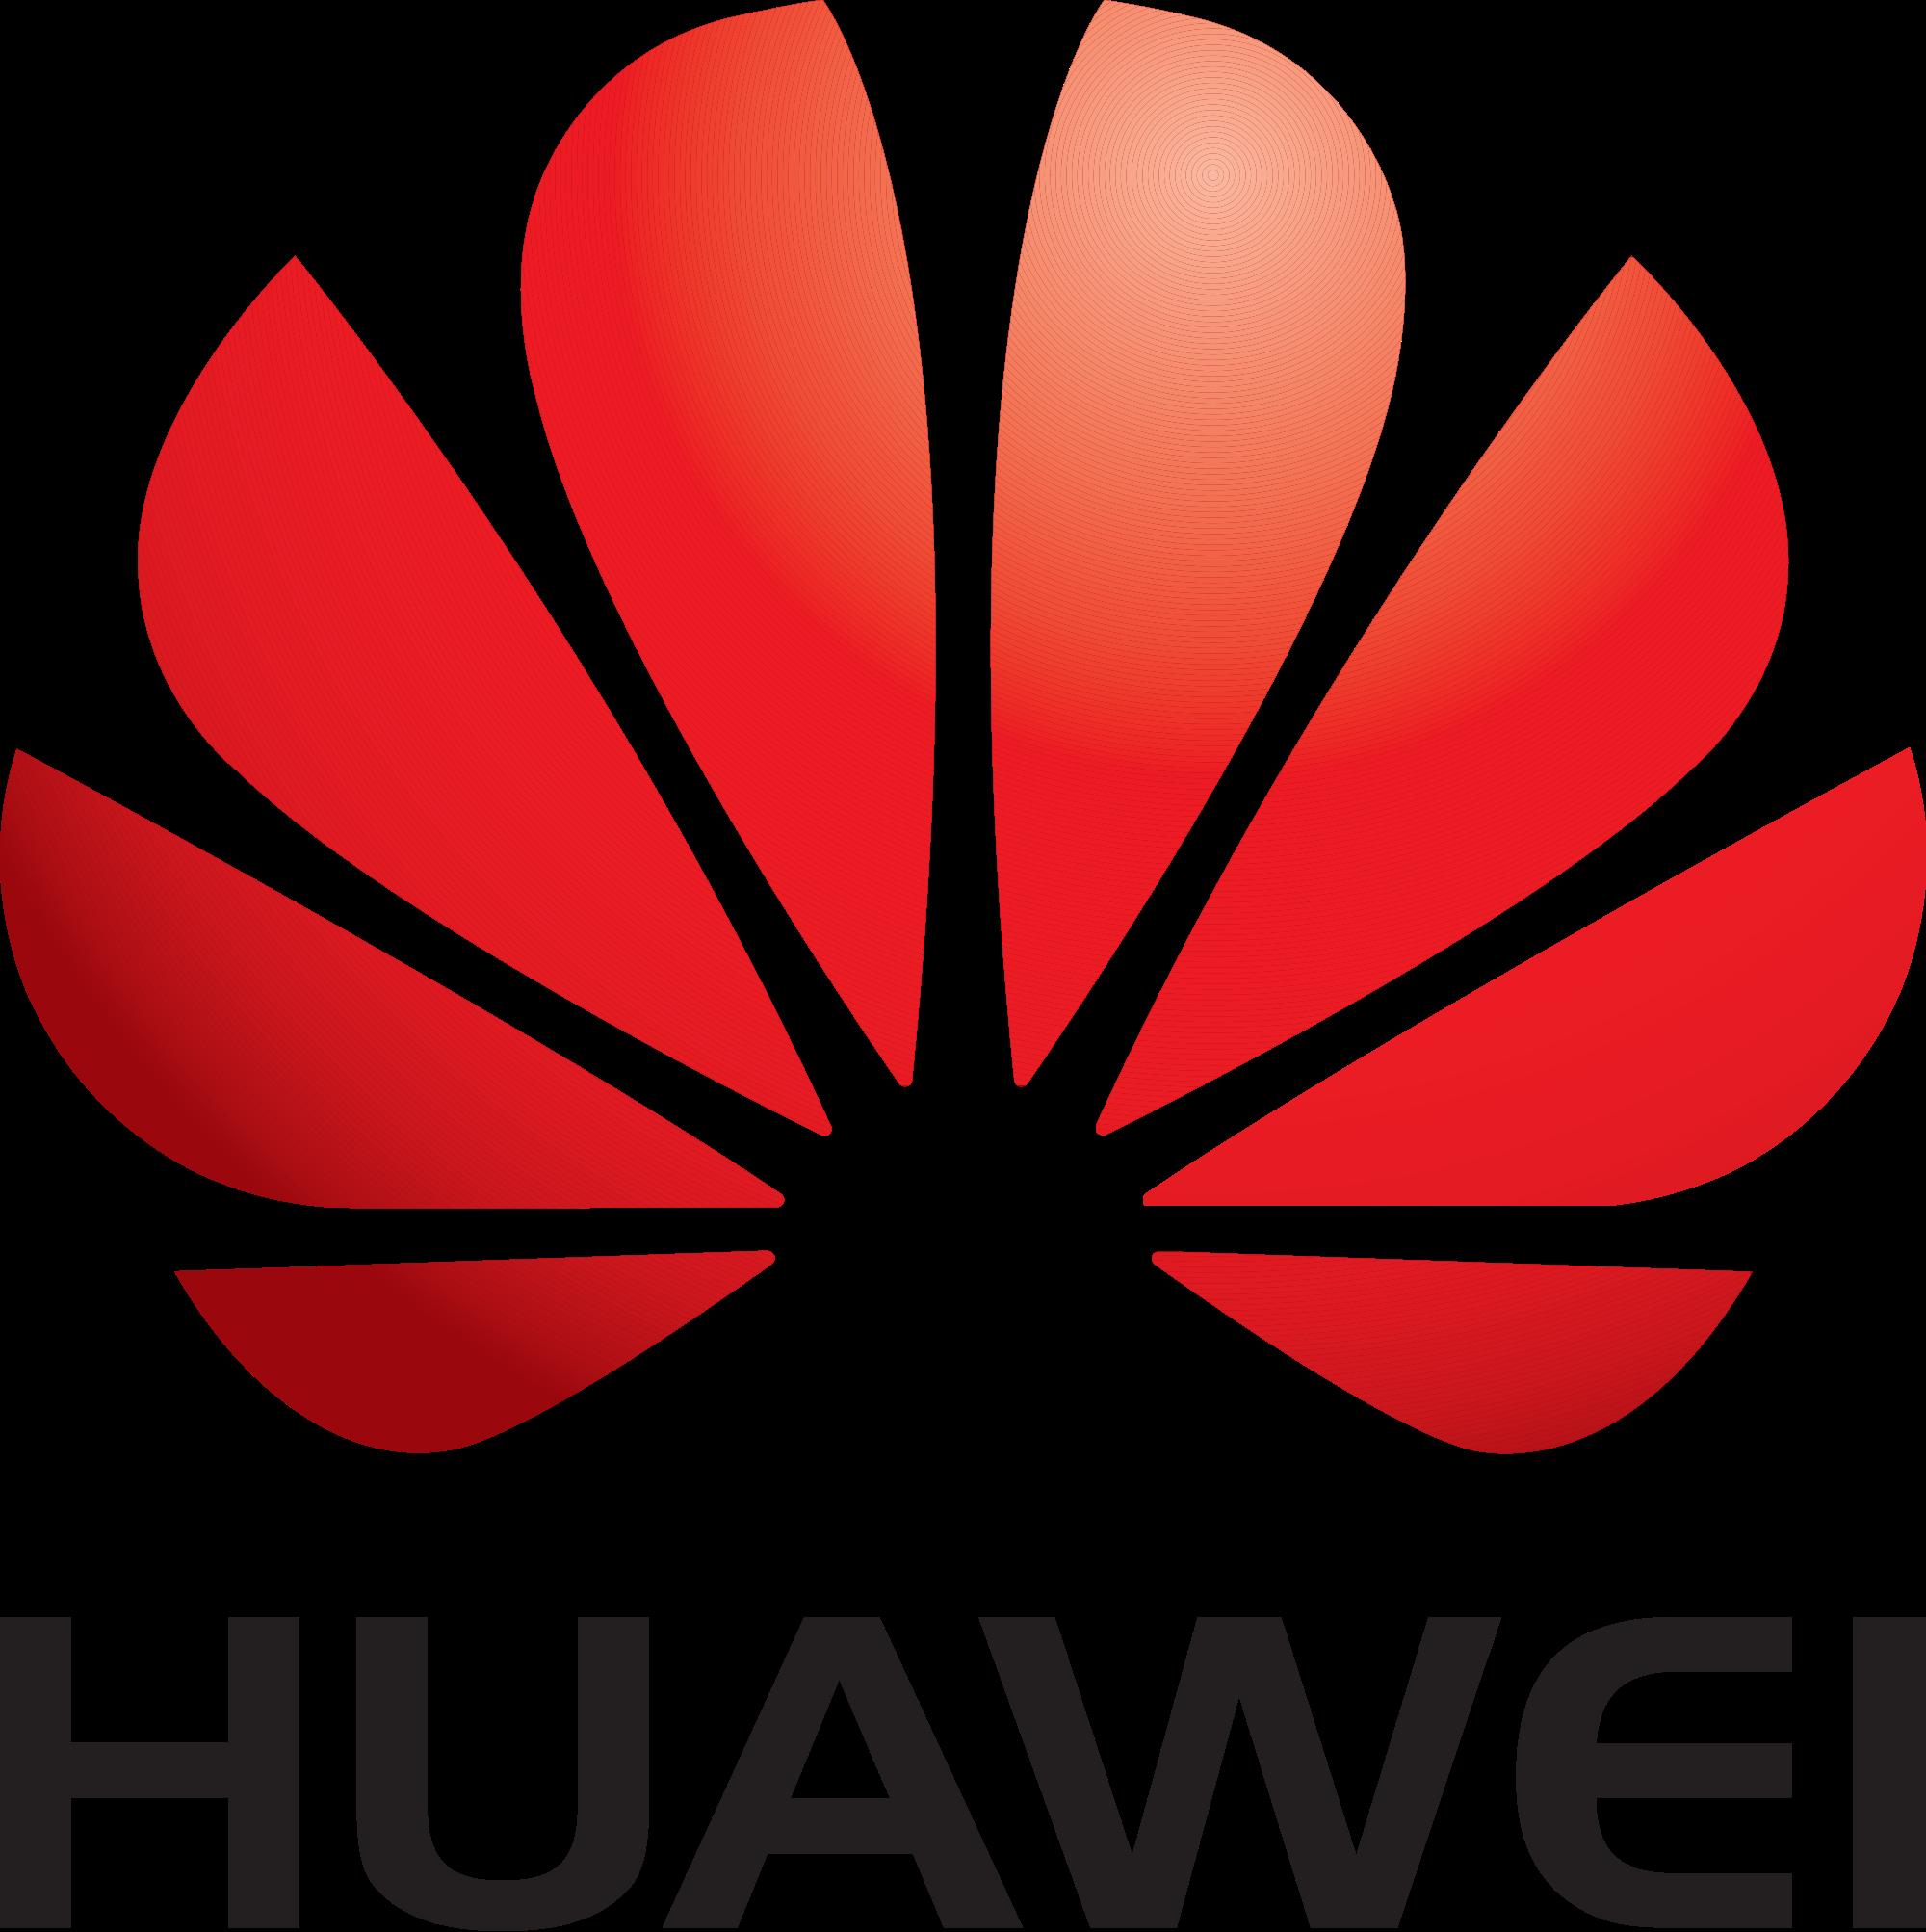 Huawei Wins Top 10 Highest Award at SNEC 2019